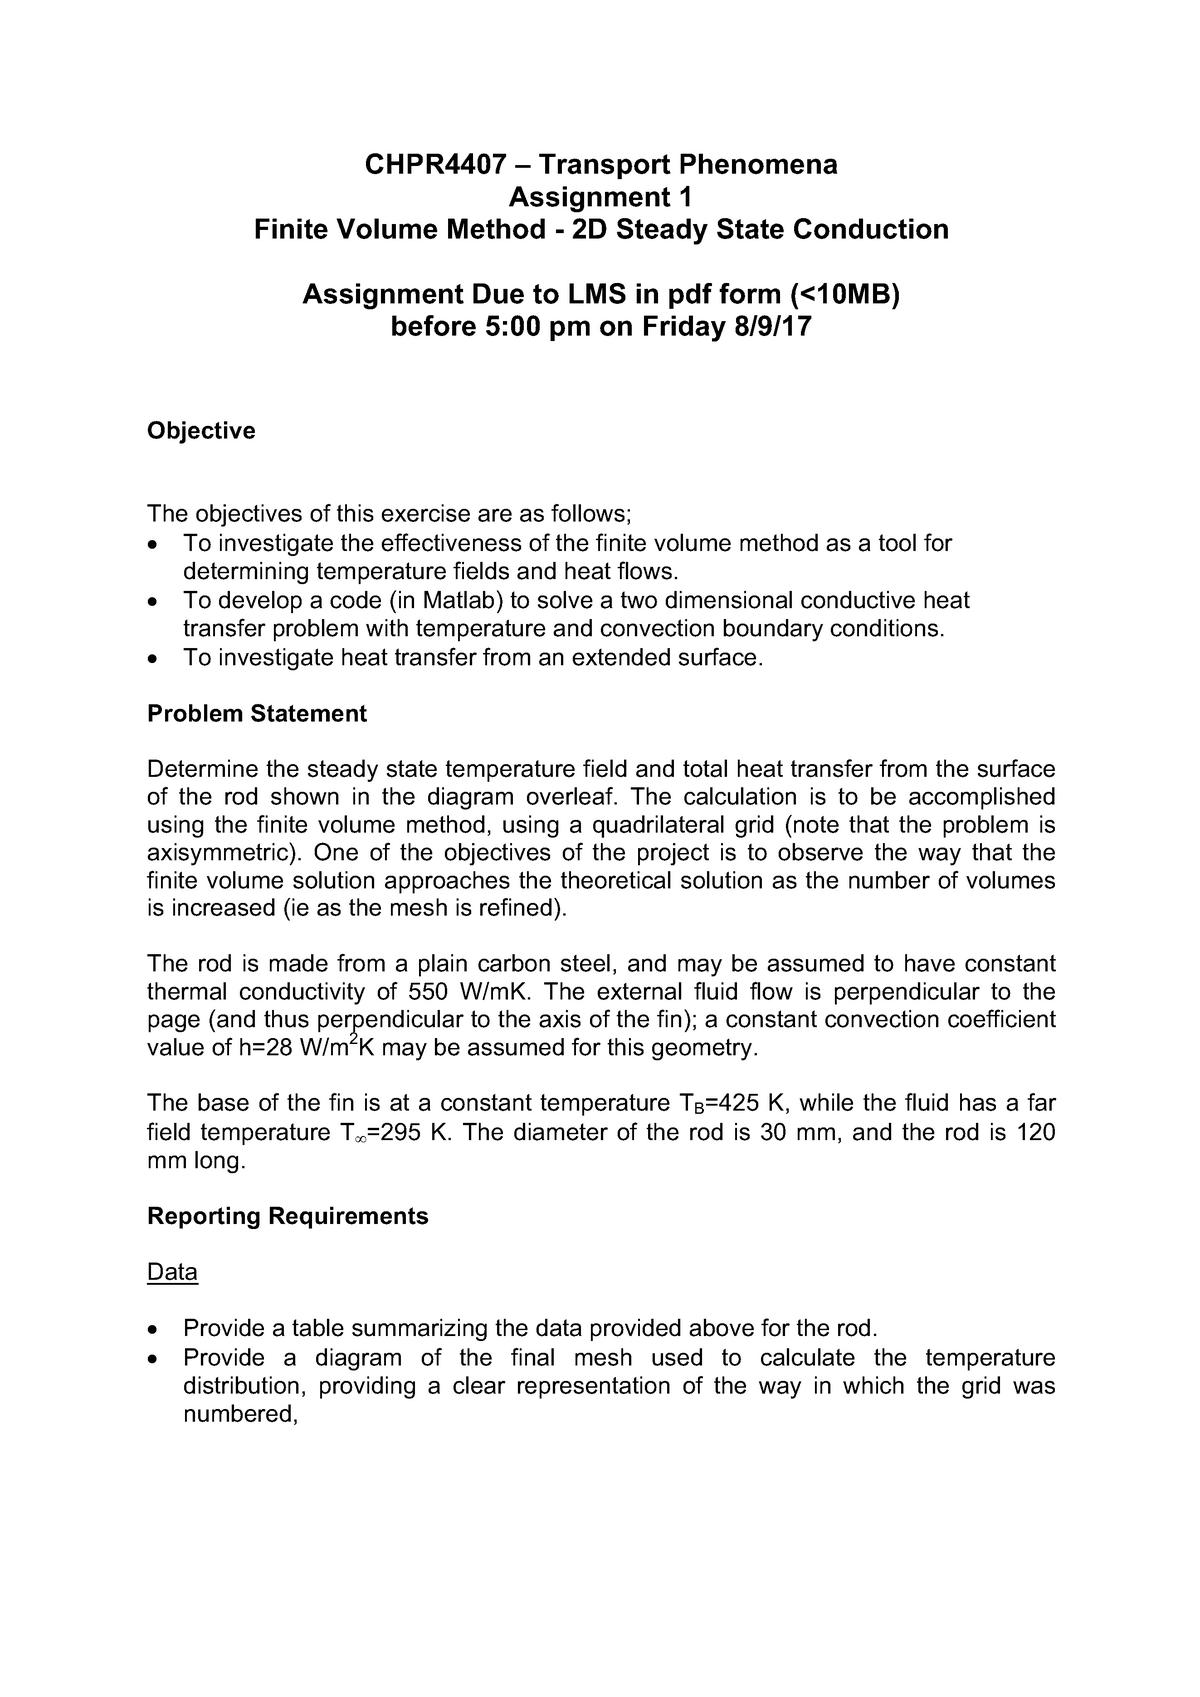 Conduction Assignment - CHPR4407 : Transport Phenomena - StuDocu